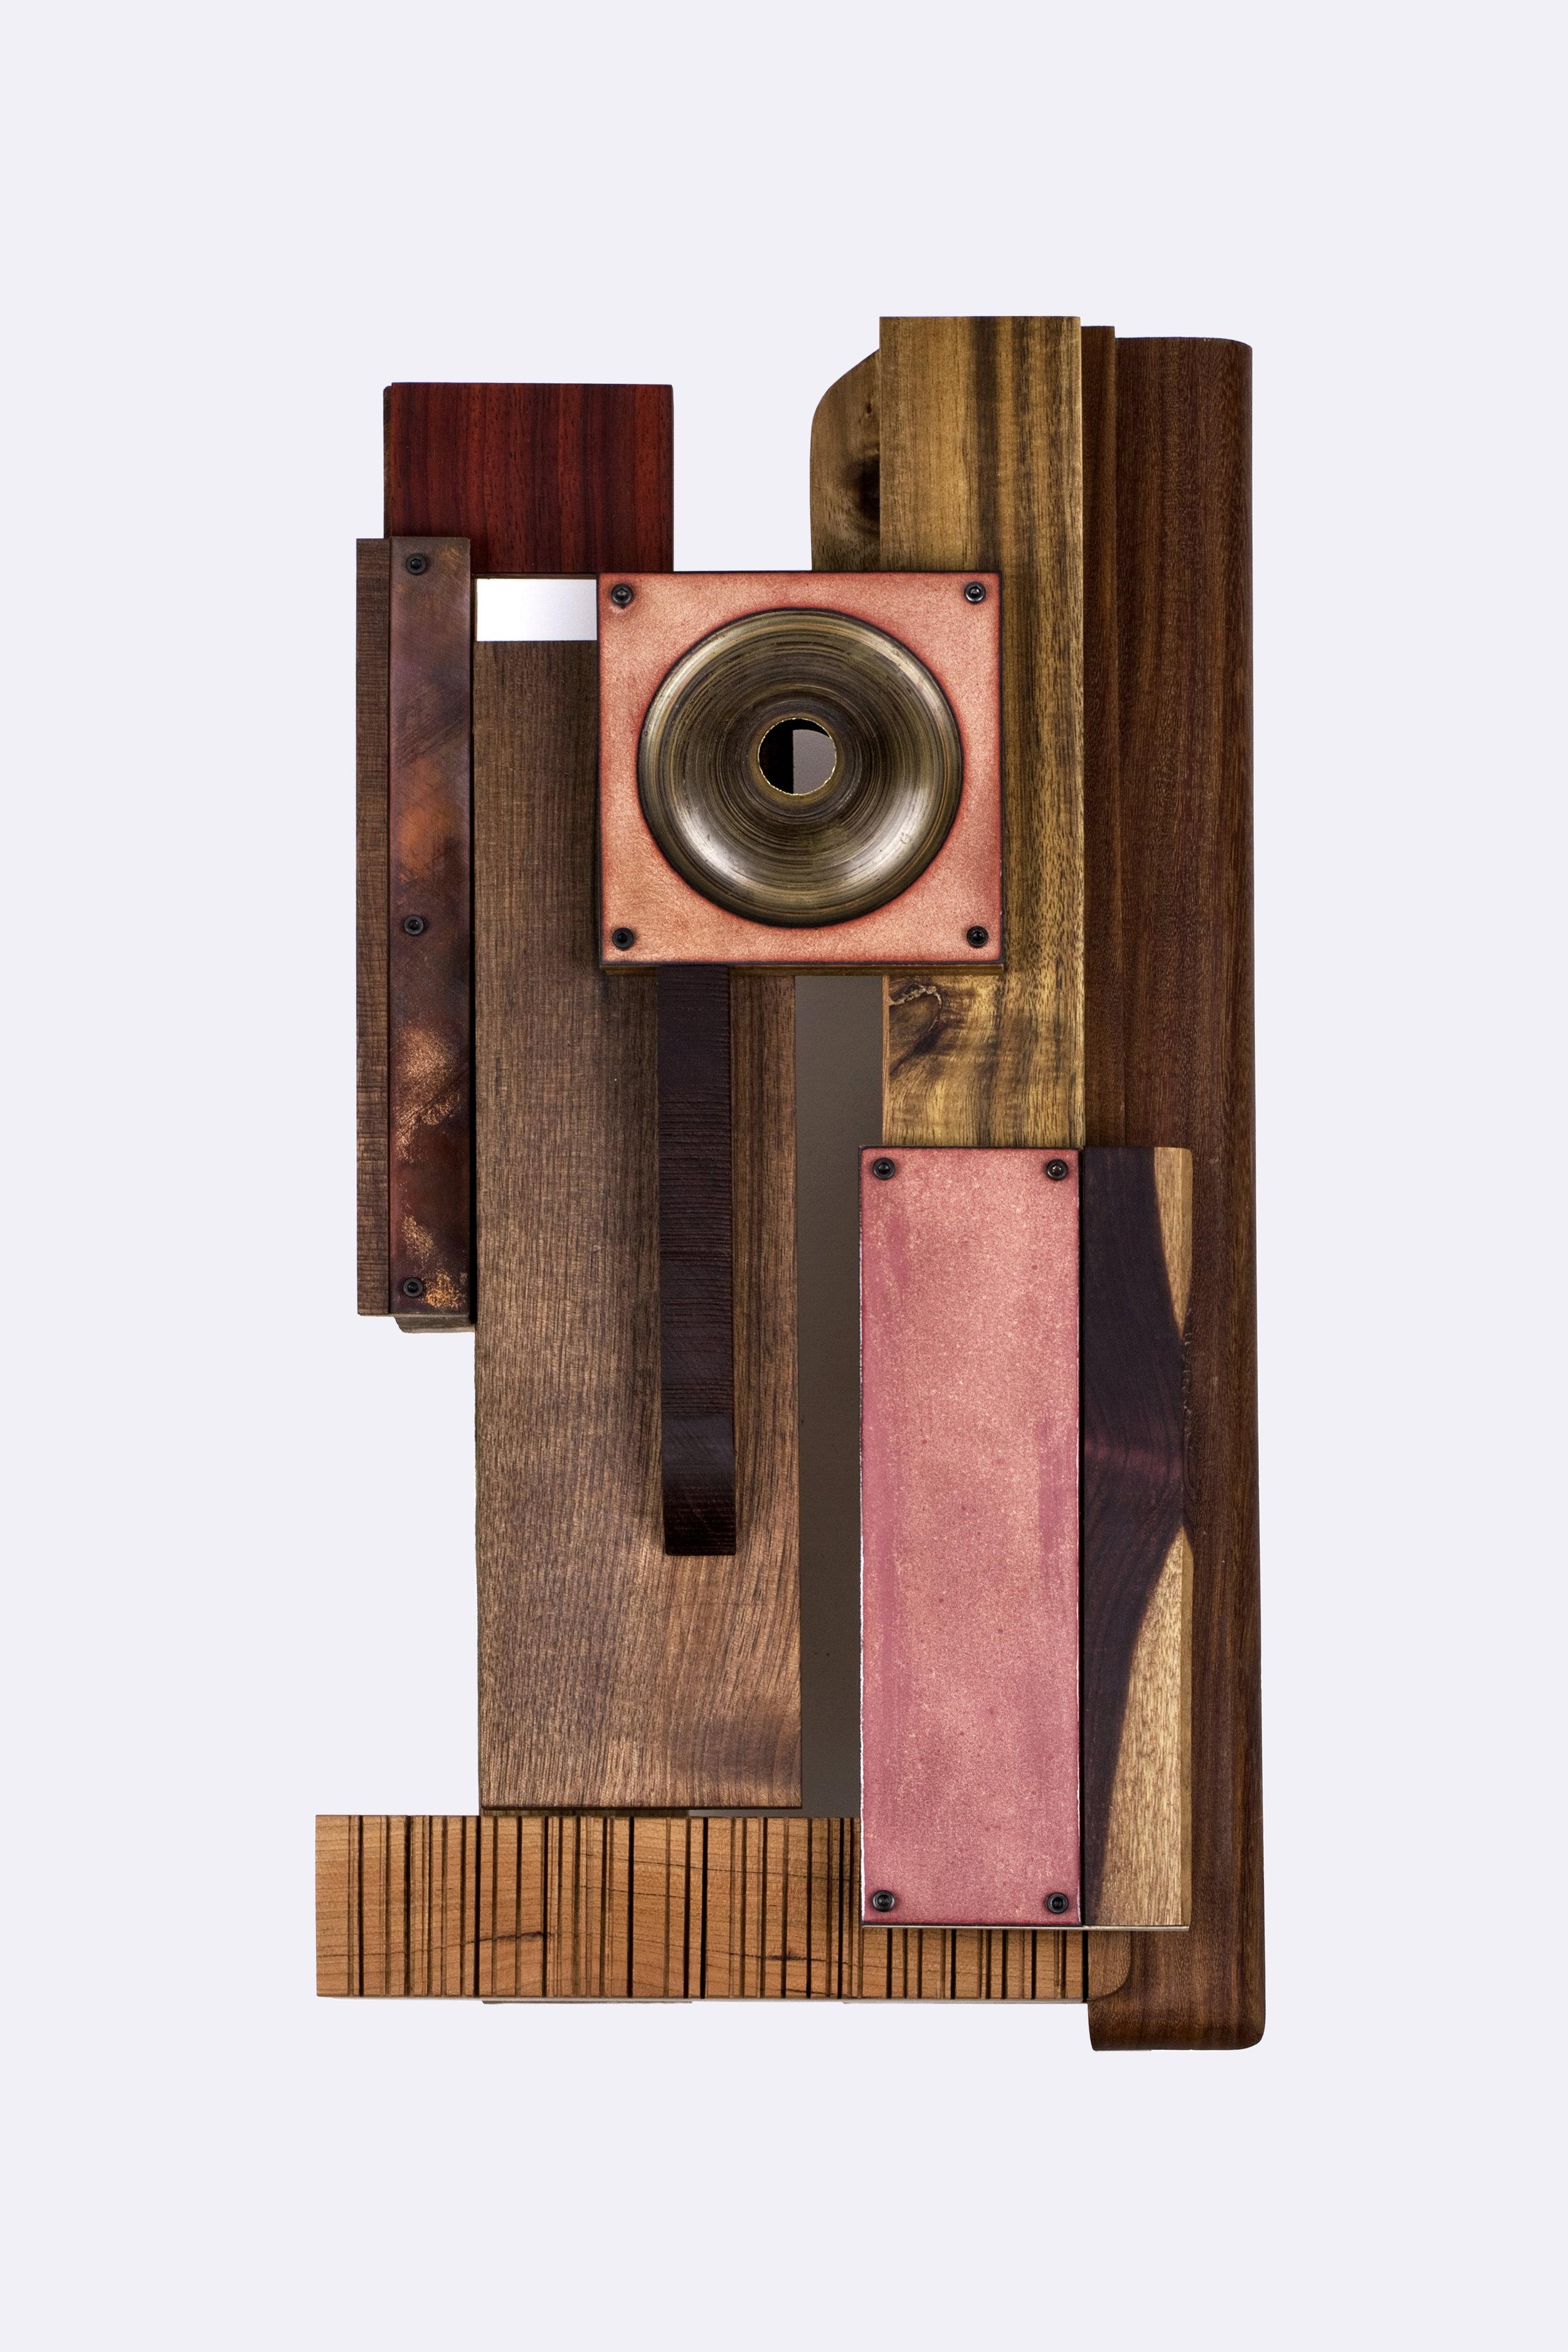 Ydmyk    Wall sculpture, 2018   44x24x10,5cm   Materials: Wood, copper, steel, enamel, found objects.  Photo credit: Aliona Pazdniakova